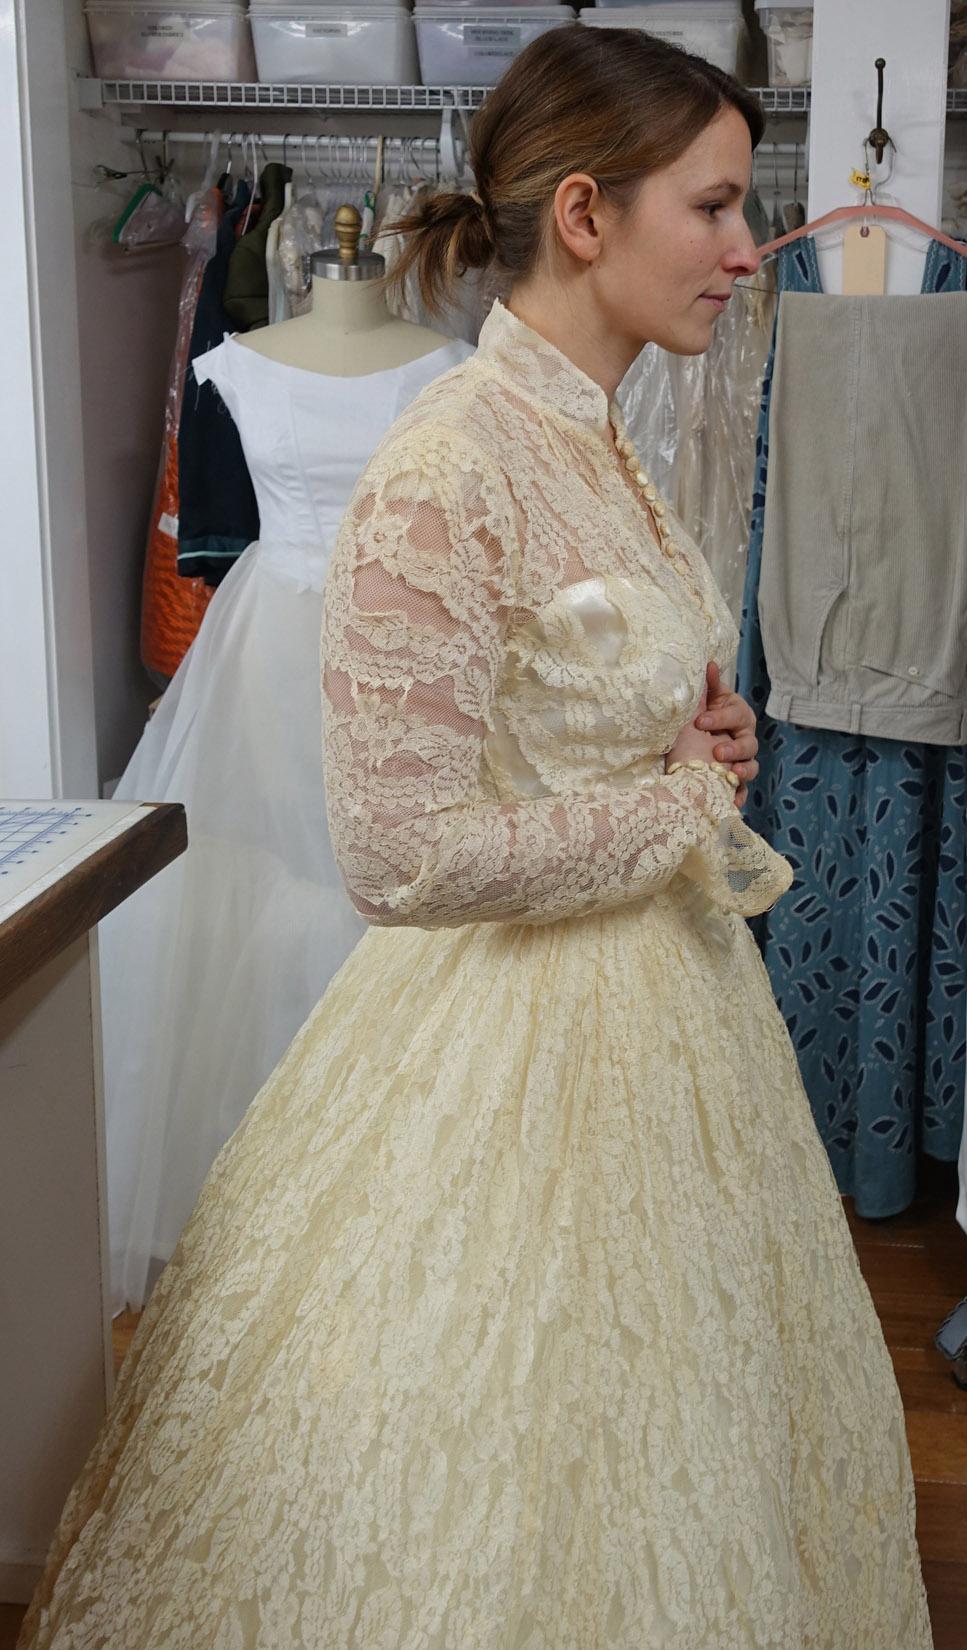 Antique Lace Gown Before Restoration